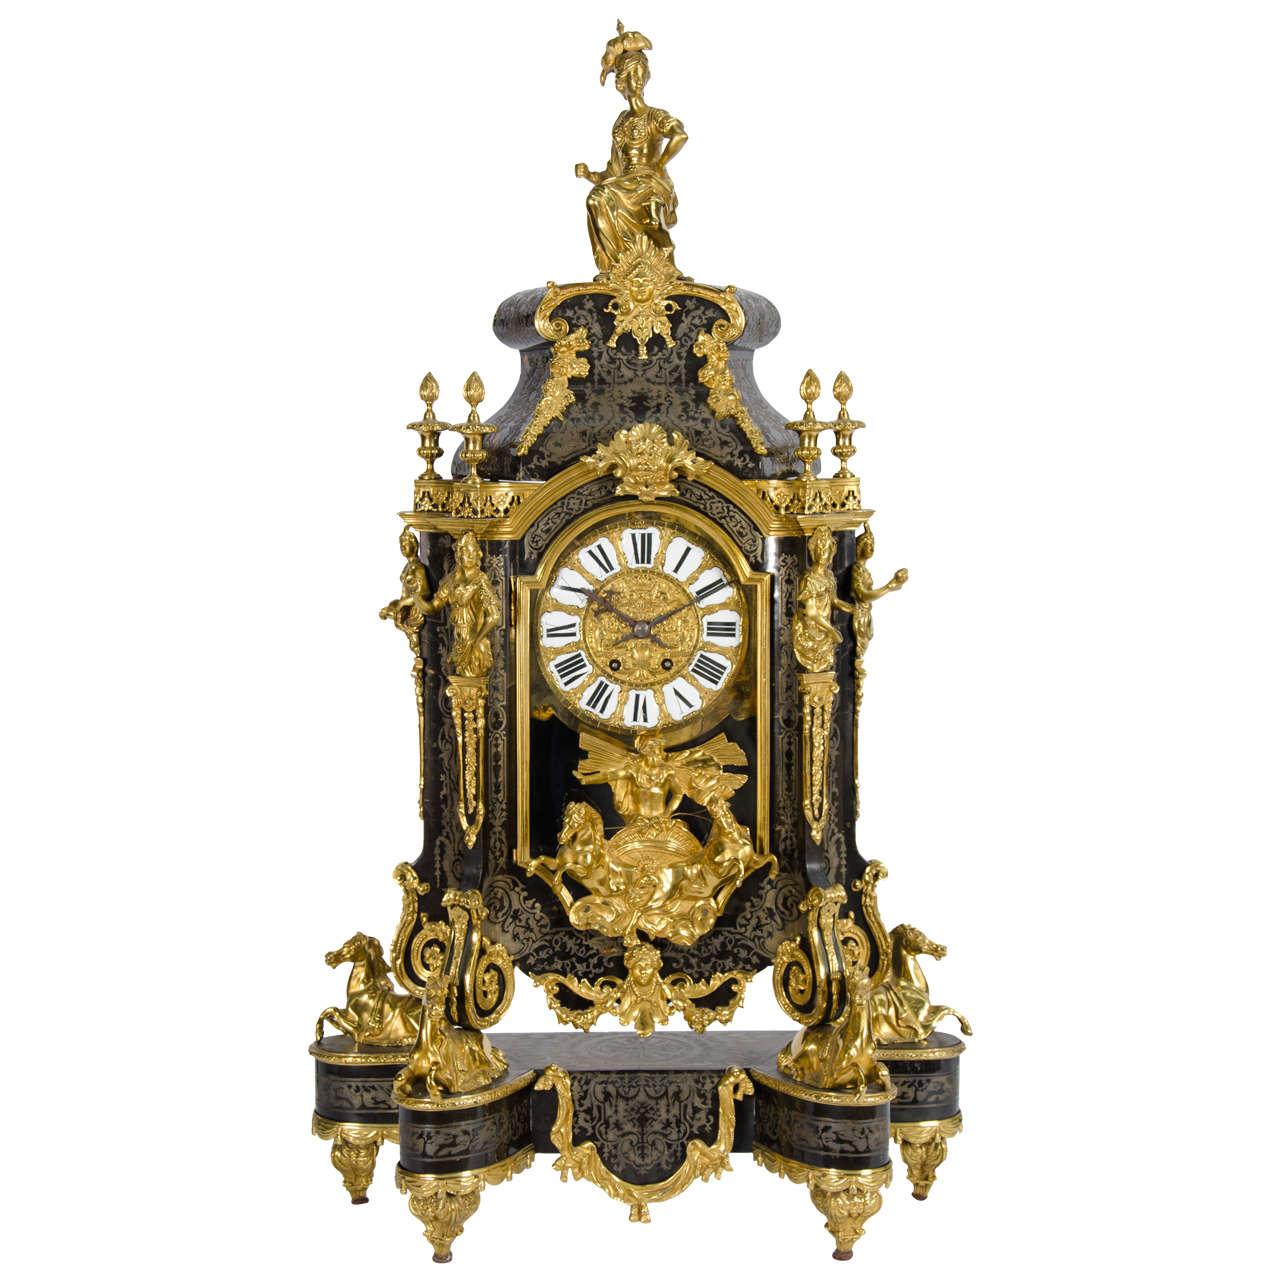 Some Clock History